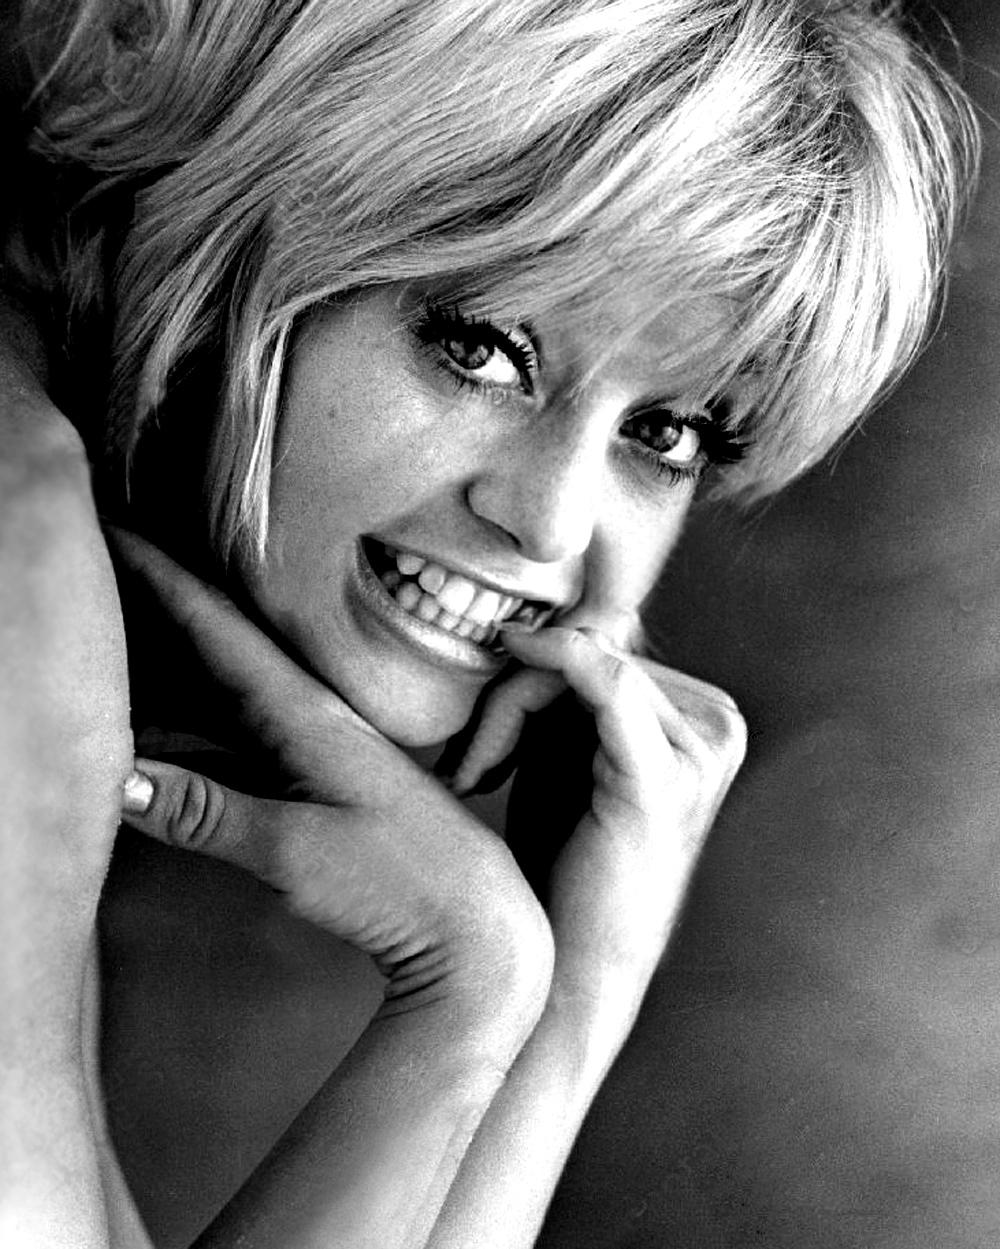 File:Goldie Hawn - 1970.jpg - Wikipedia